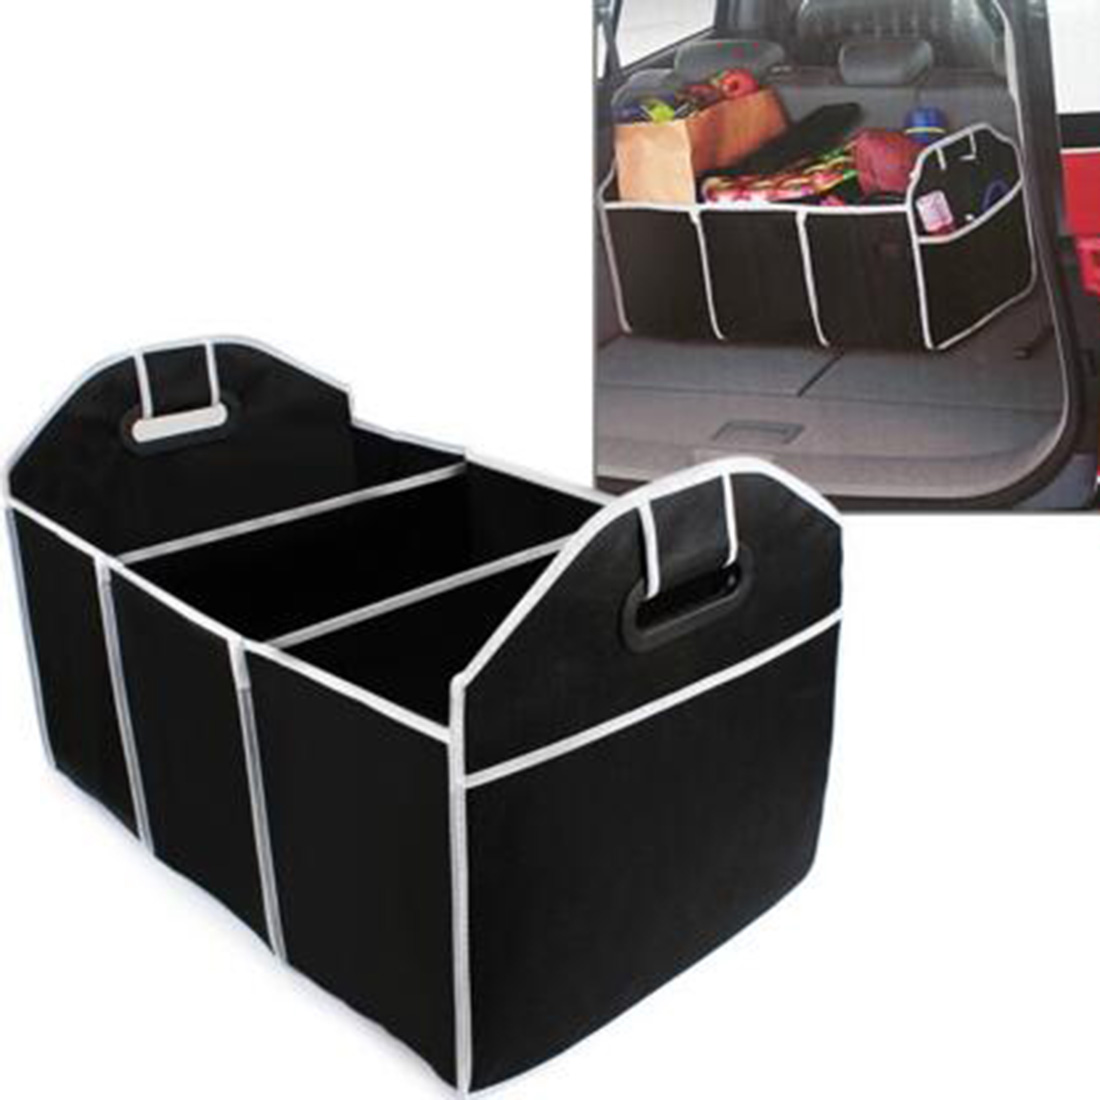 Dewtreetali Kofferbak Organizer Auto Speelgoed Voedsel Opslag Container Zakken Doos Styling Auto Interieur Accessoires Levert Gear